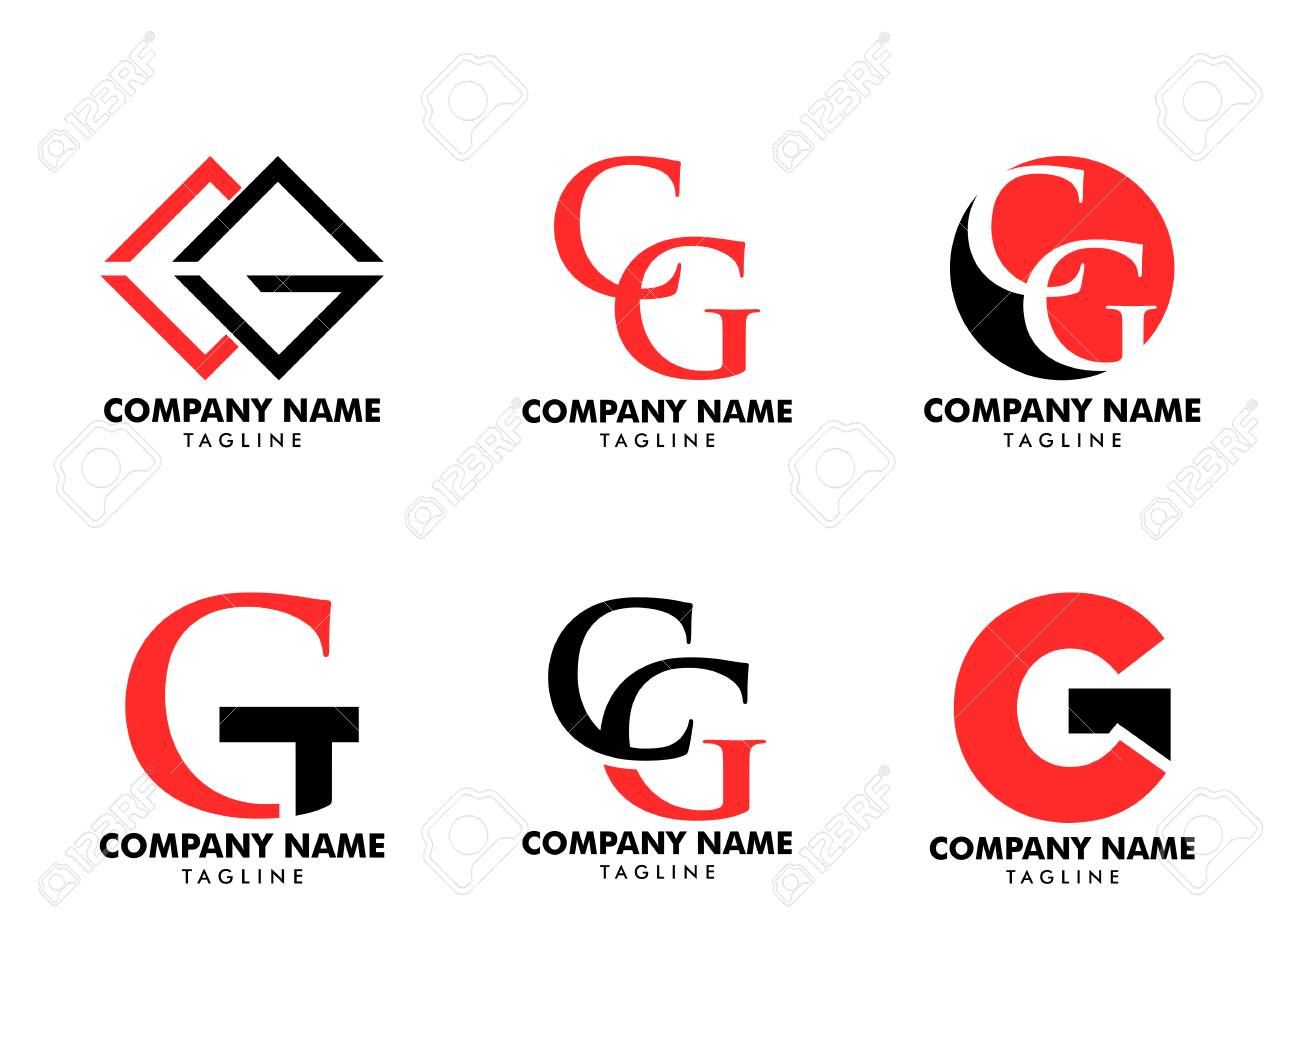 Set of Initial illustration of letter cg vector logo - 119512421